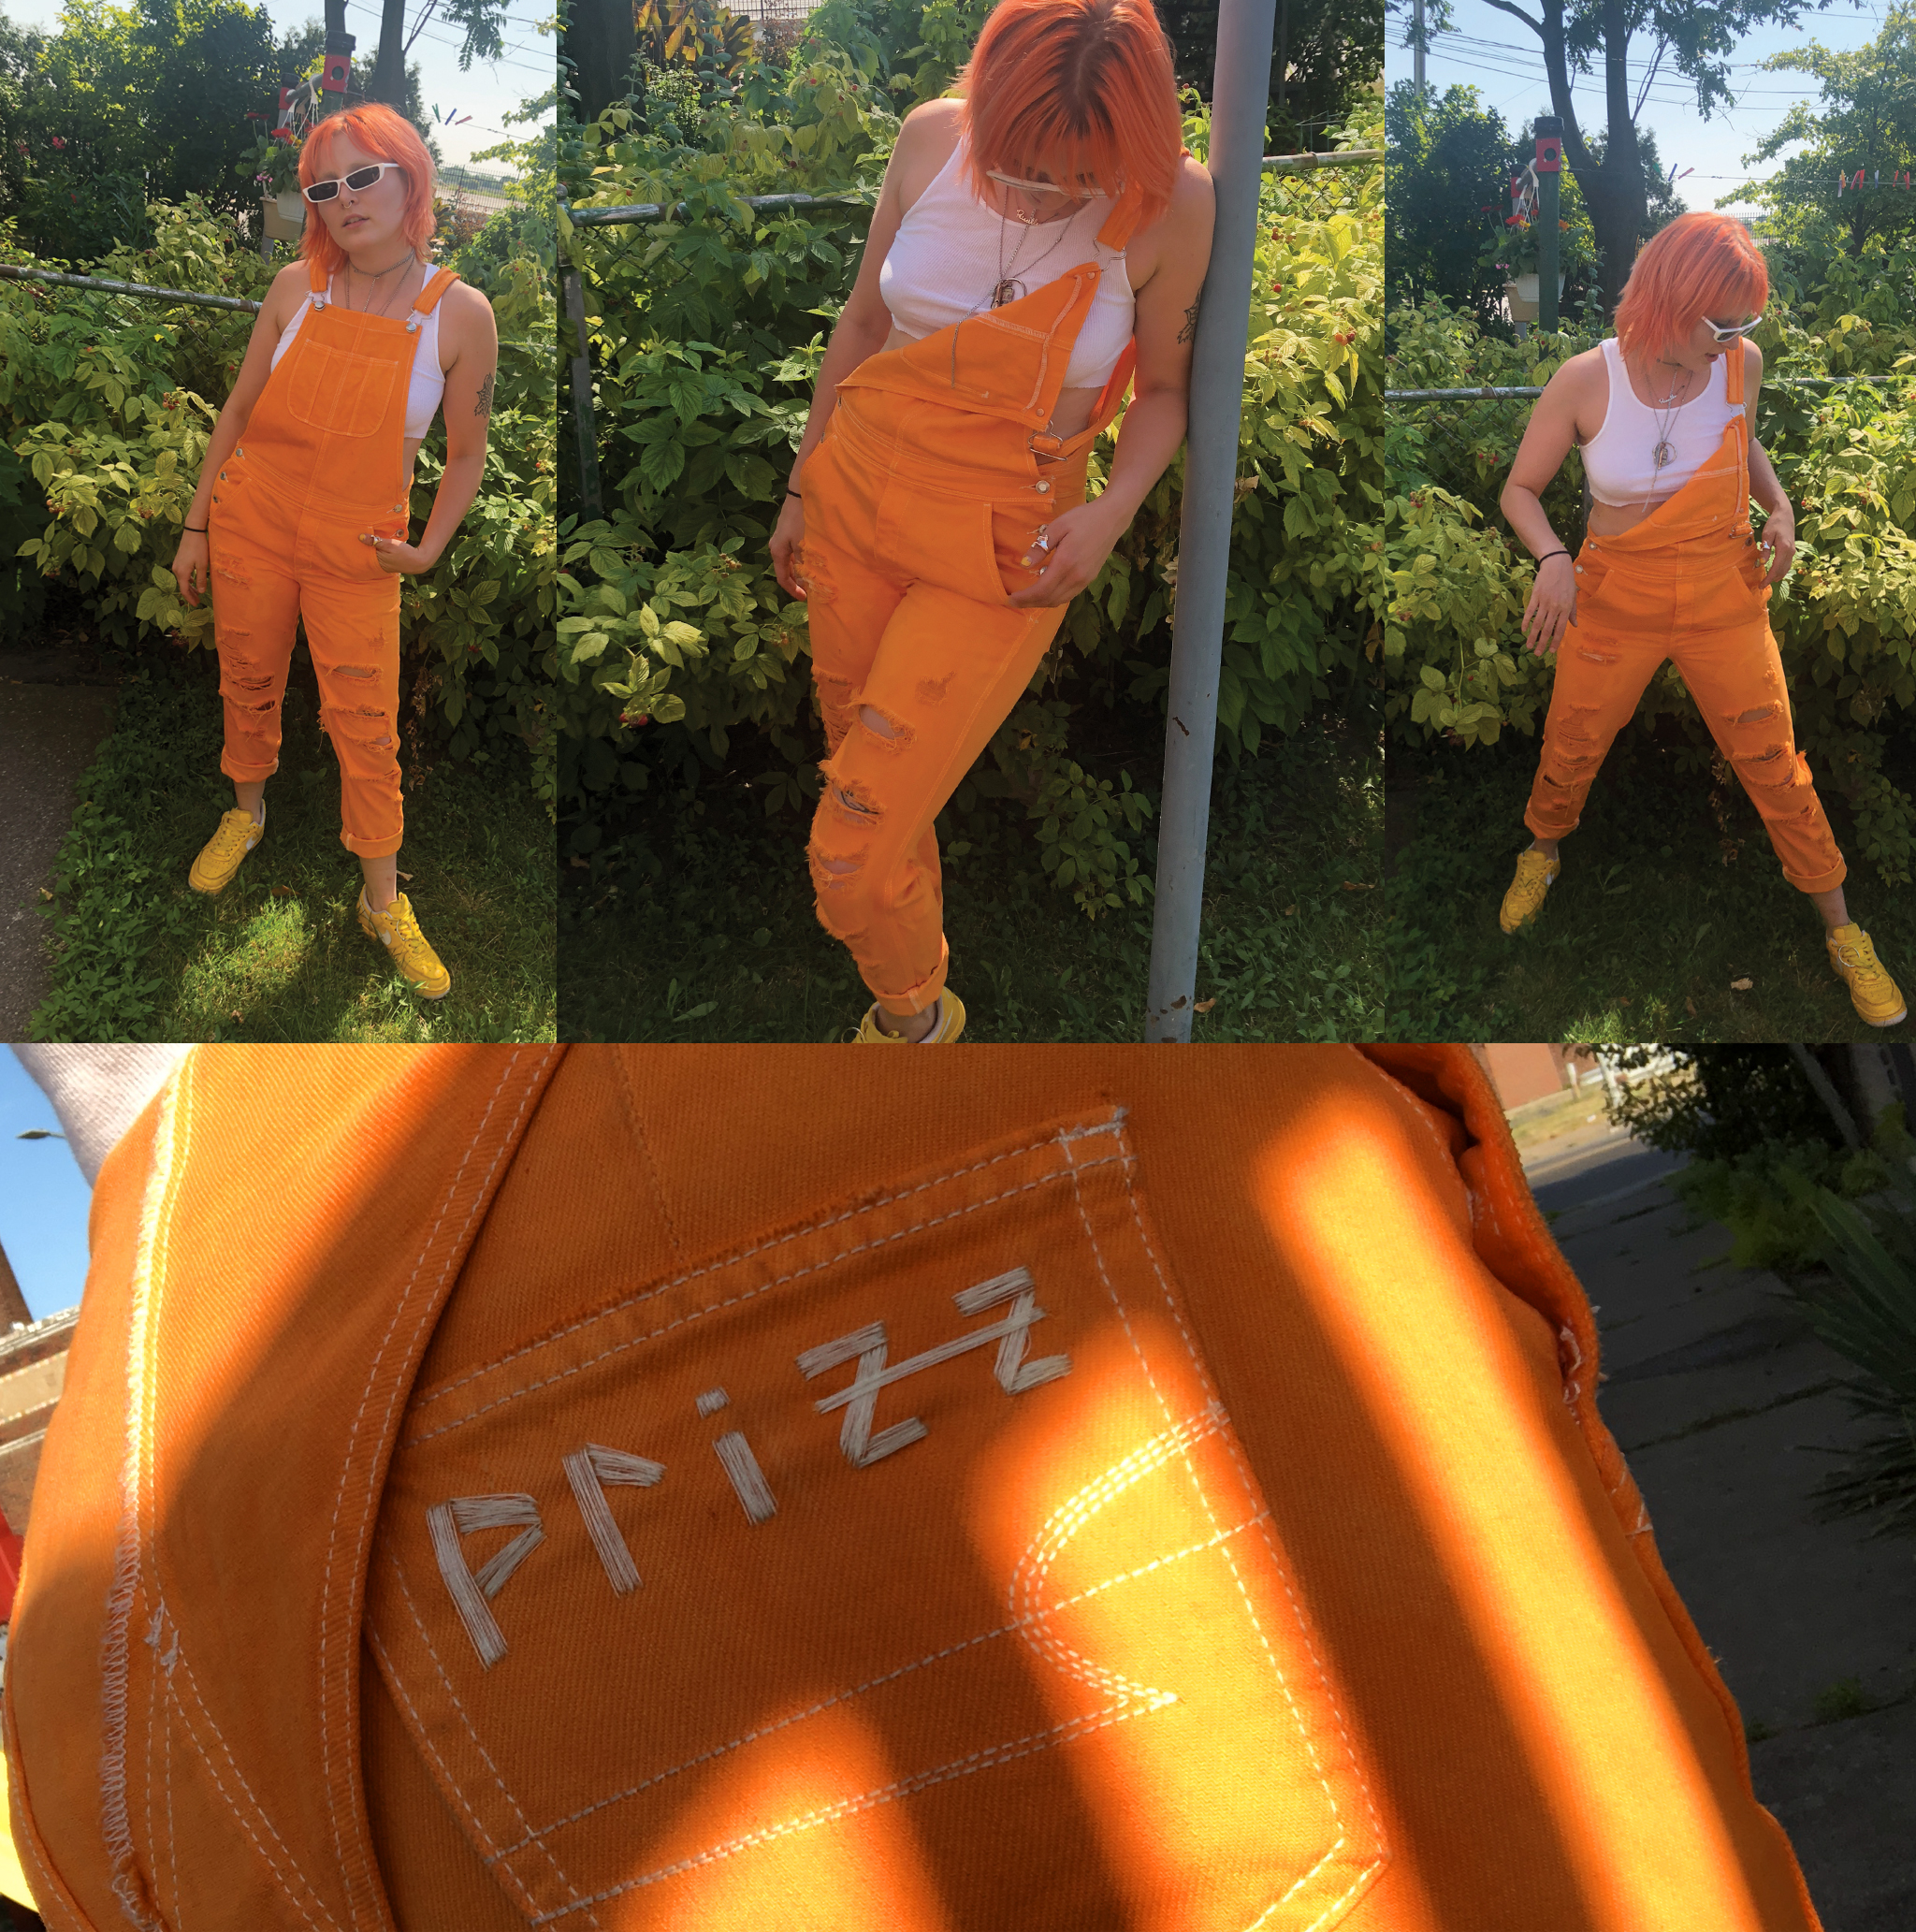 Prizzcilla in her custom made overalls